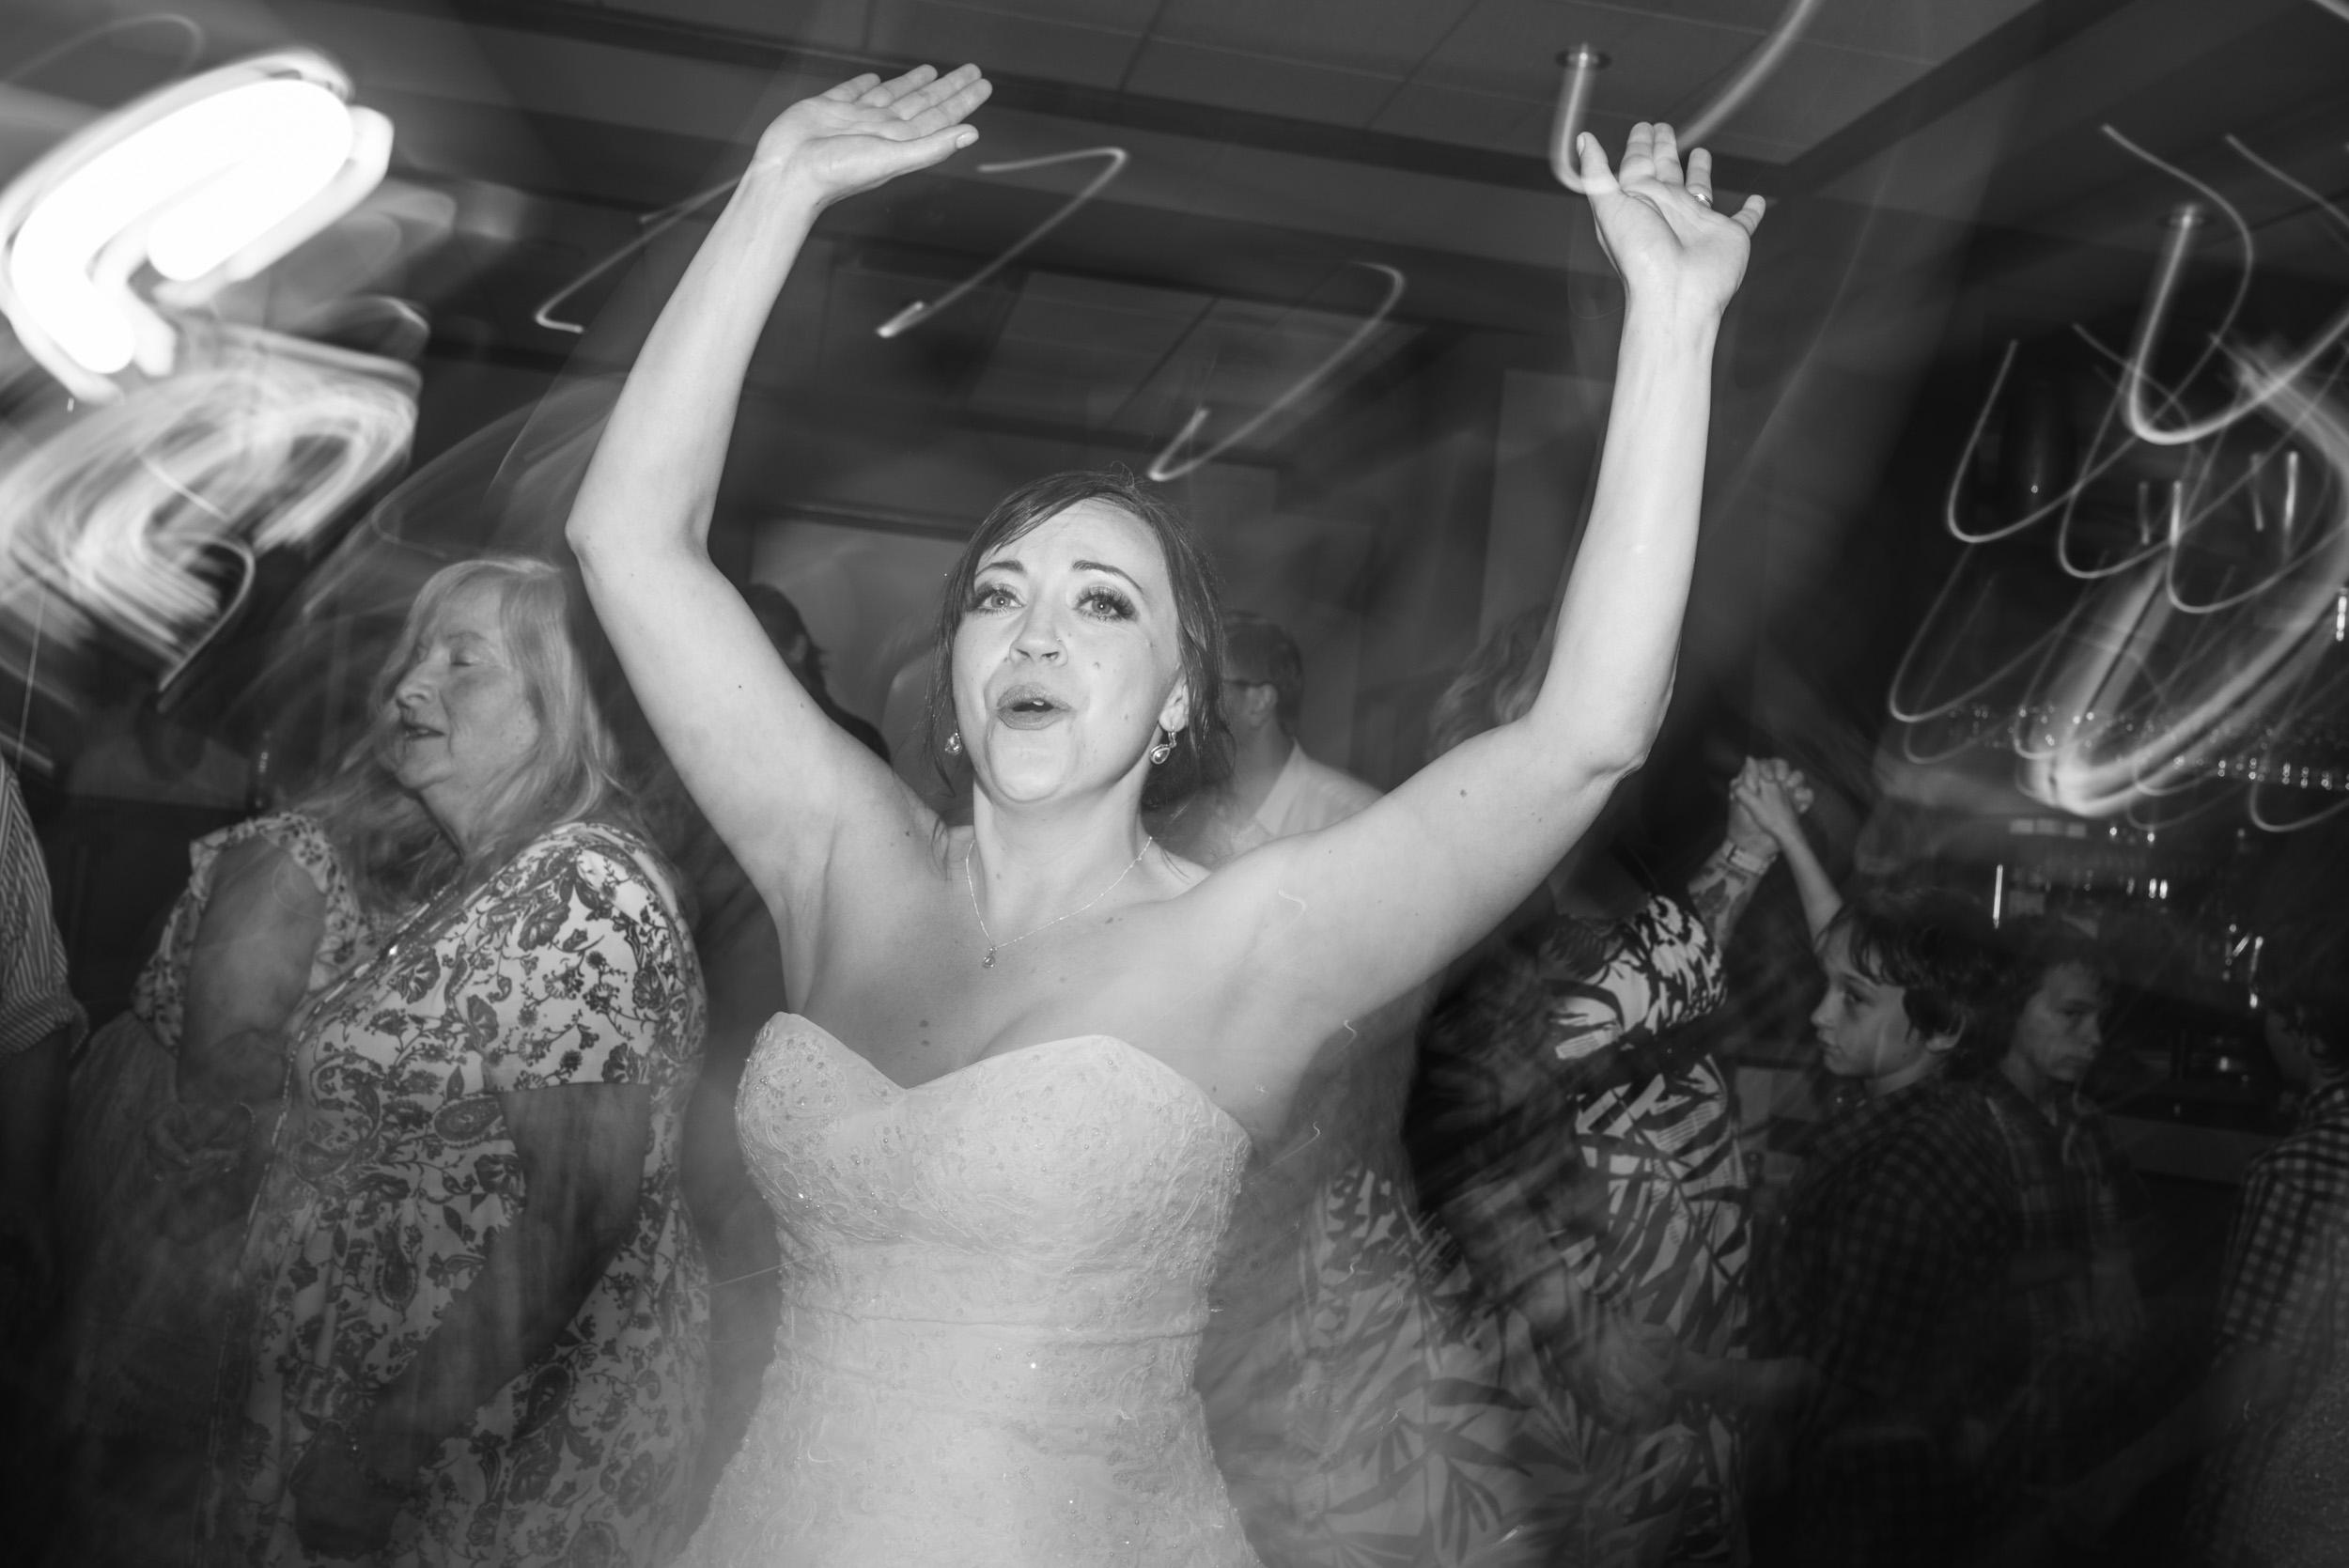 Bride dancing with lights